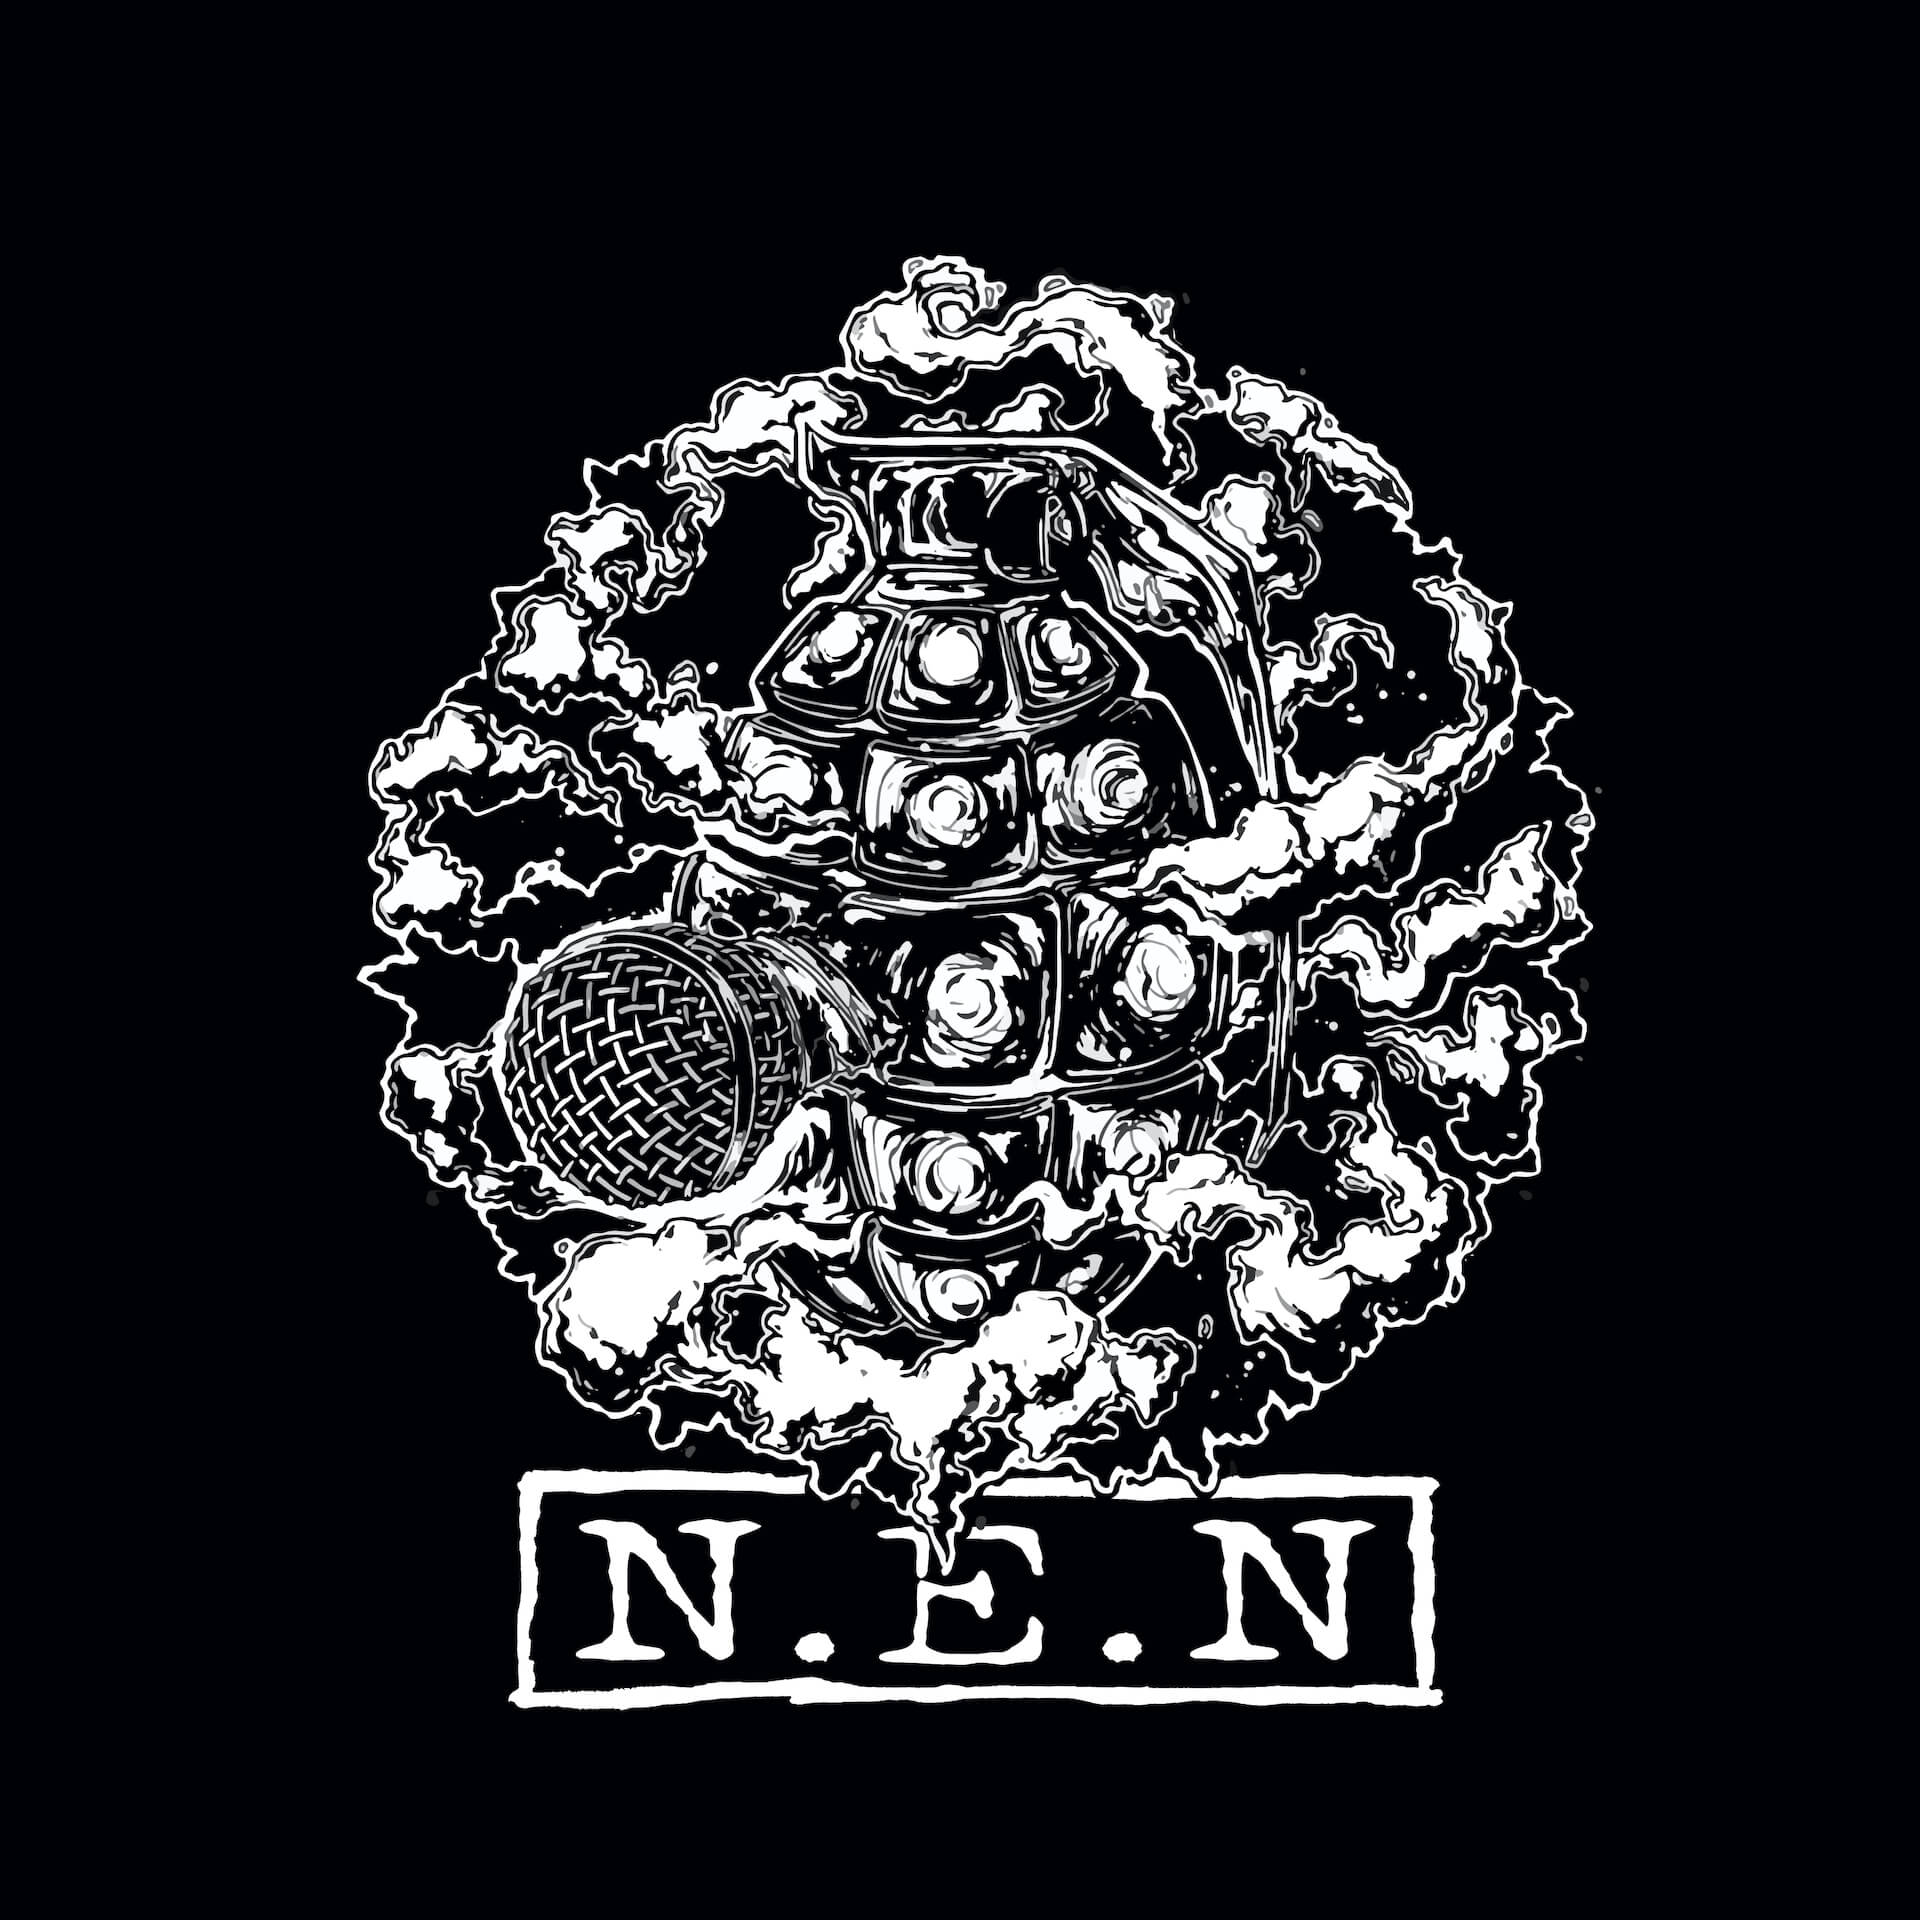 N.E.Nが1stアルバム『N.E.N』に未収録曲&BONUS TRACKを追加したLP発売を発表!リリース記念イベントも開催 music_210716_NEN10